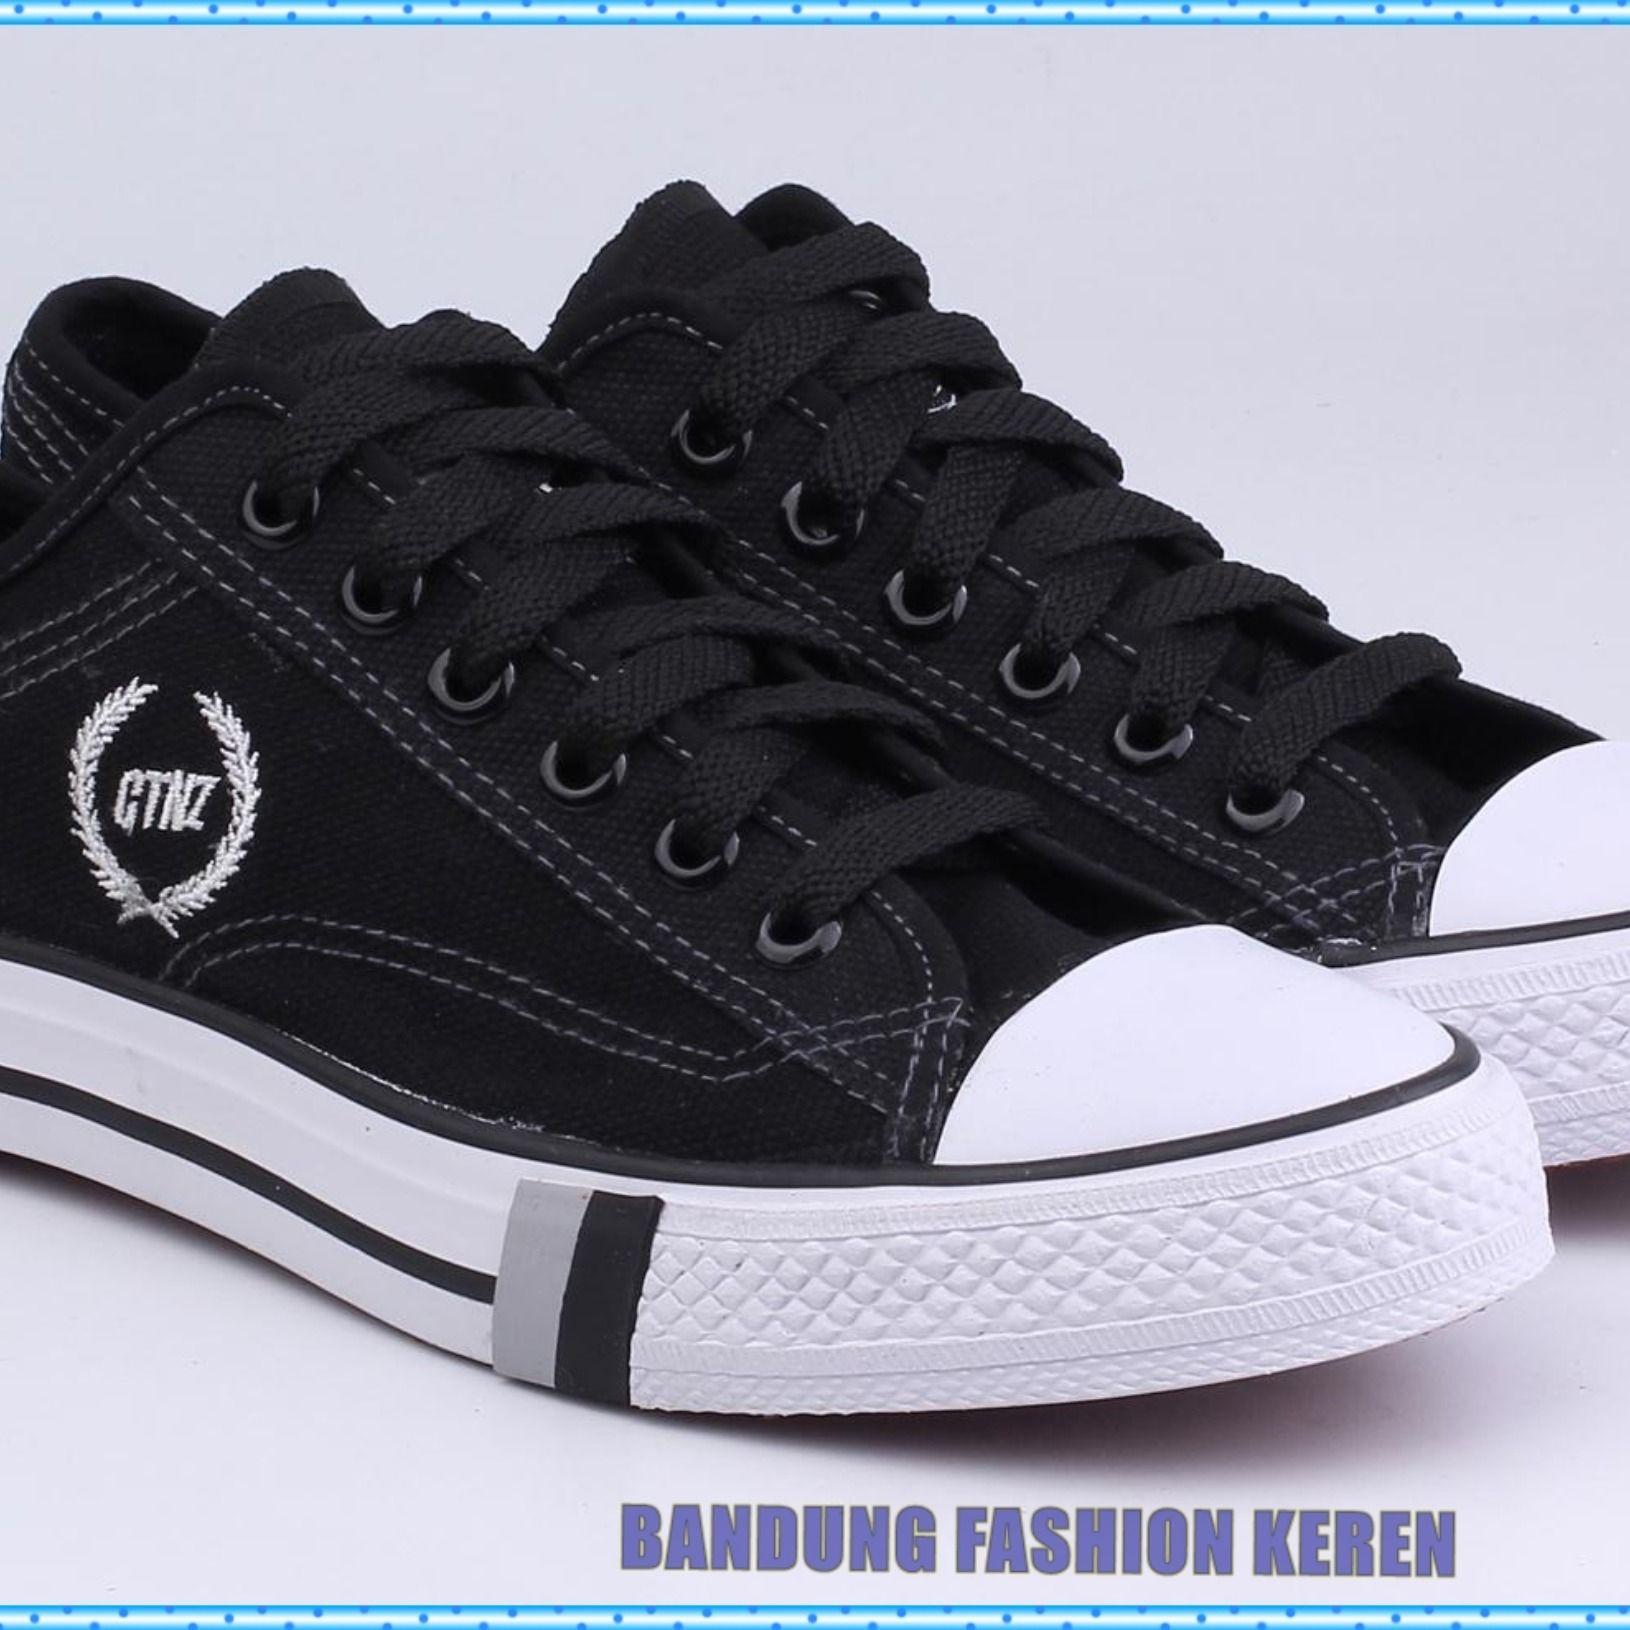 Sepatu Casual Pria Ja 001 Produk Fashion Handmade Terbaik 100